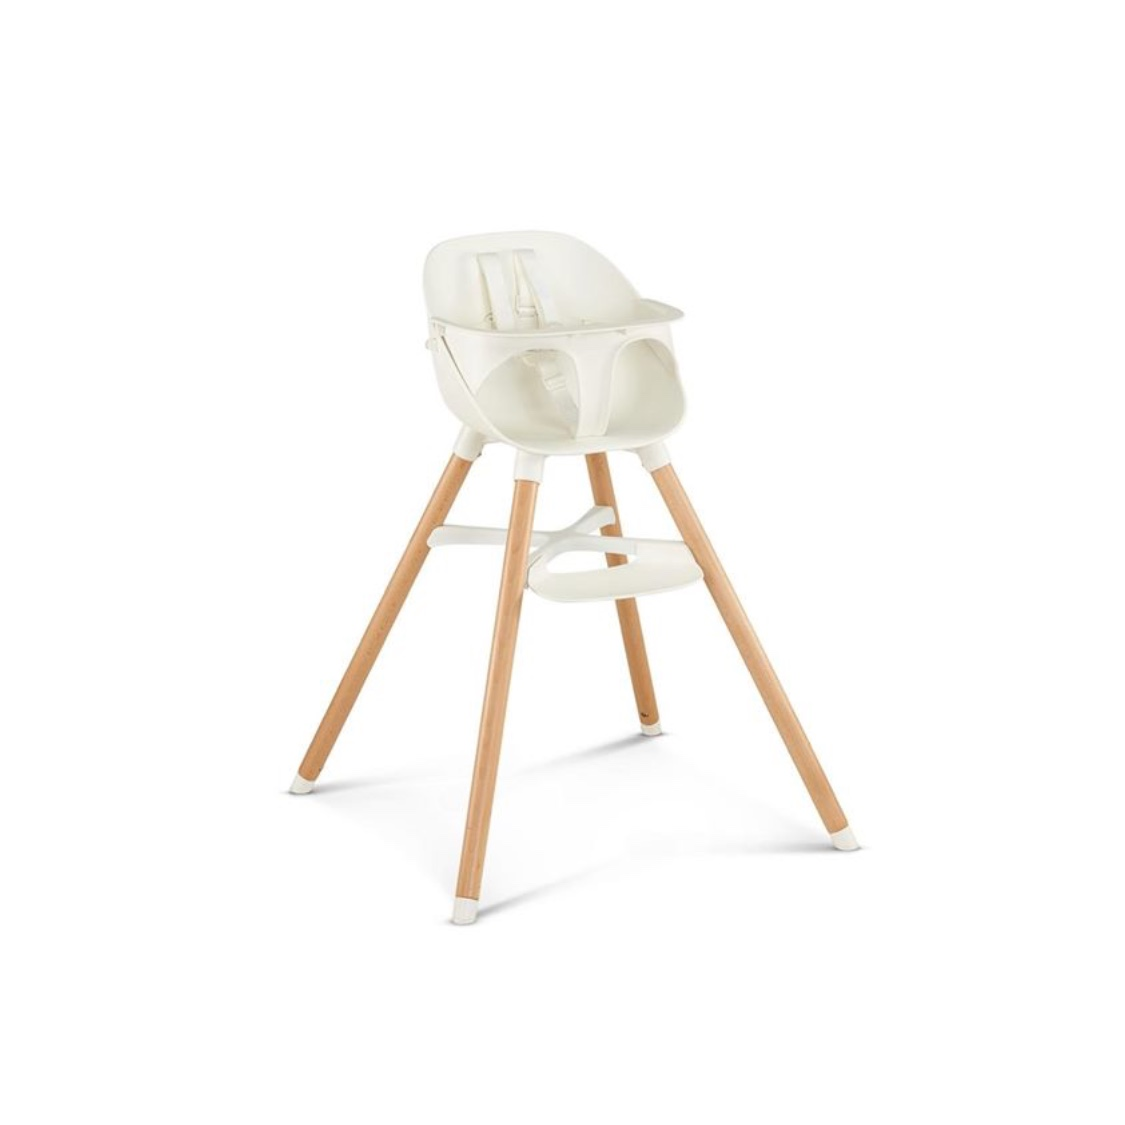 Redsbaby HILO High Chair $164